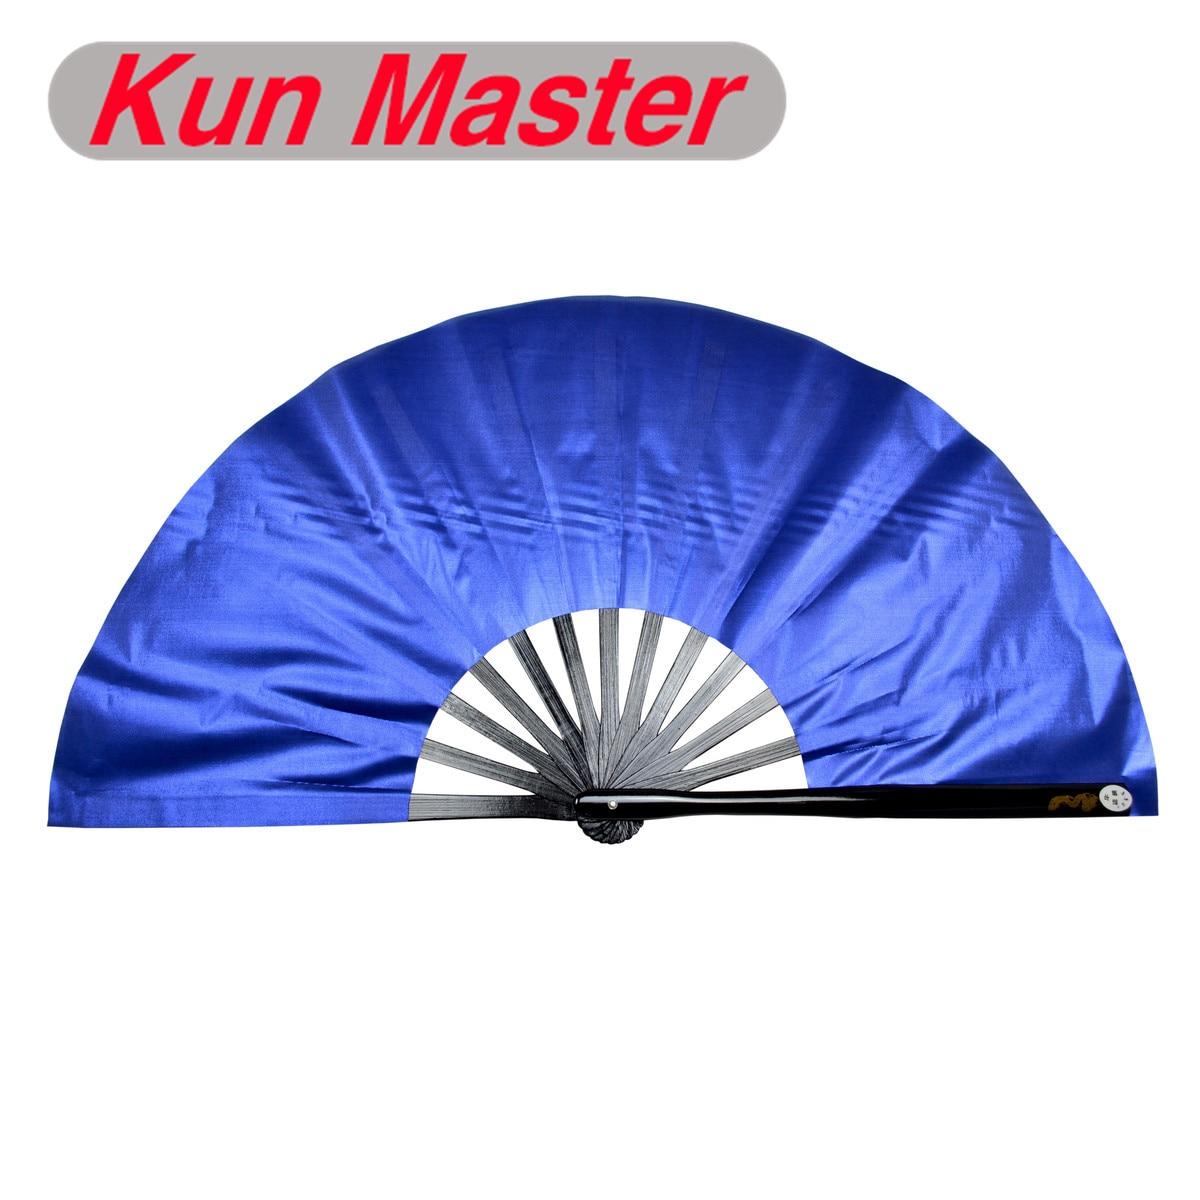 Kun maestro 34 Cm de kungfú chino Tai Chi Fan brillo cubierta azul